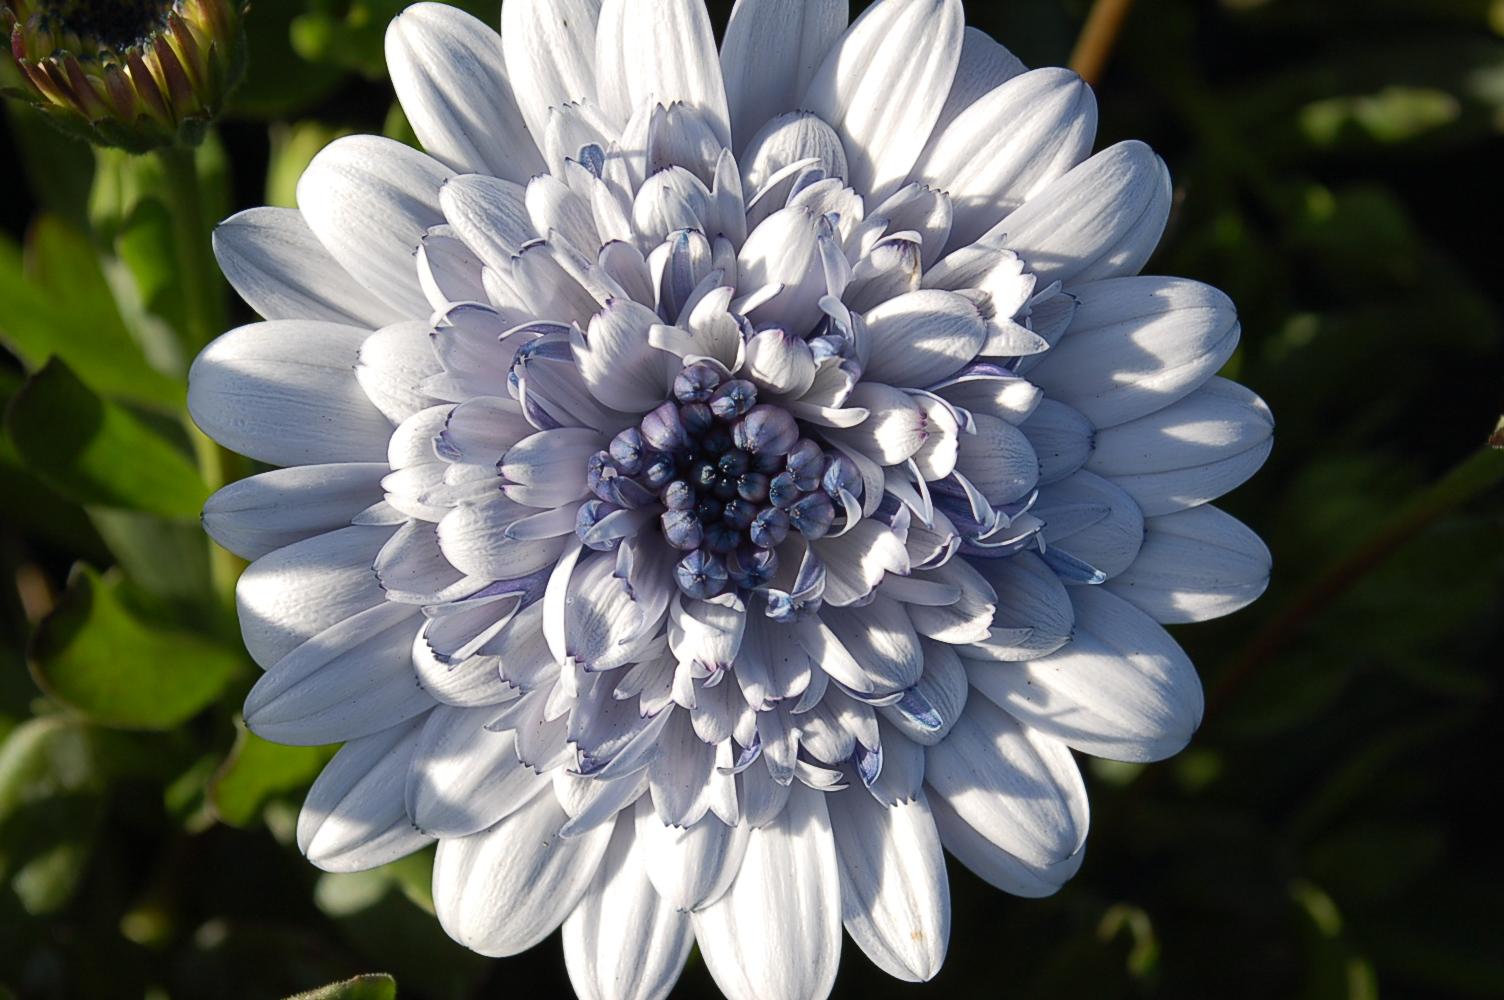 041919 SPRING FLOWERS 002